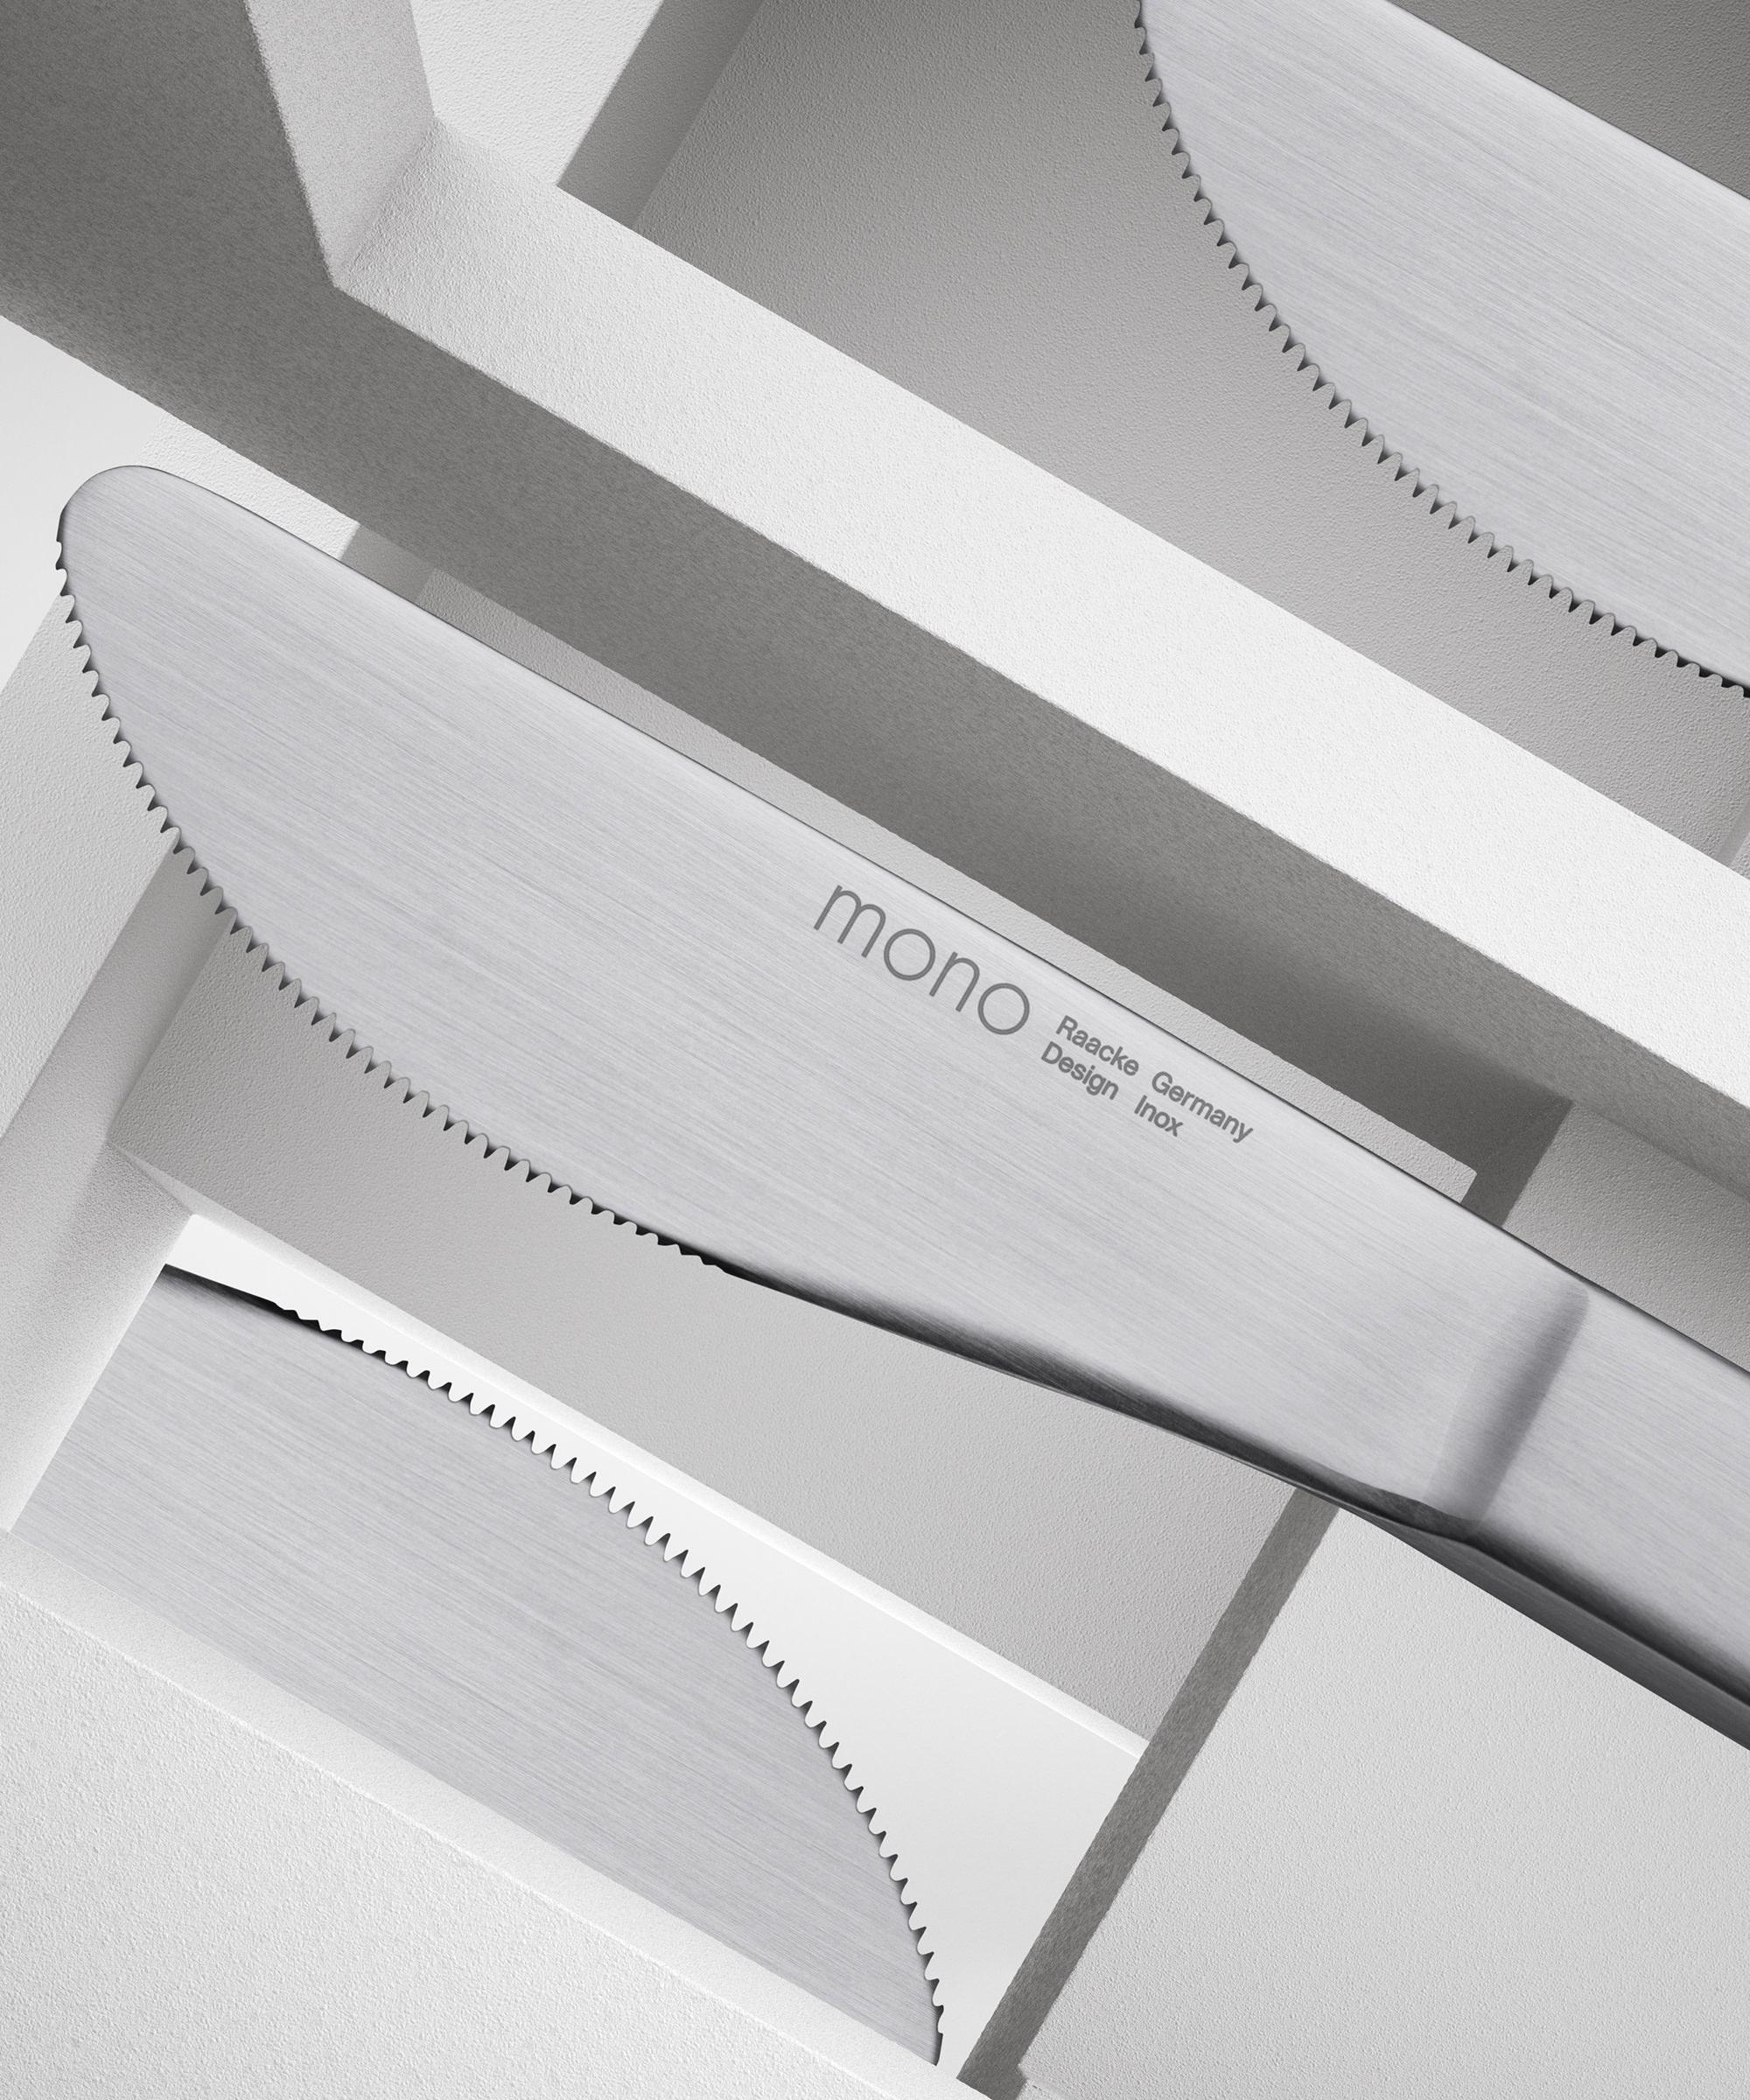 Mono A Besteck Flatware Credits Hawlin Services 07